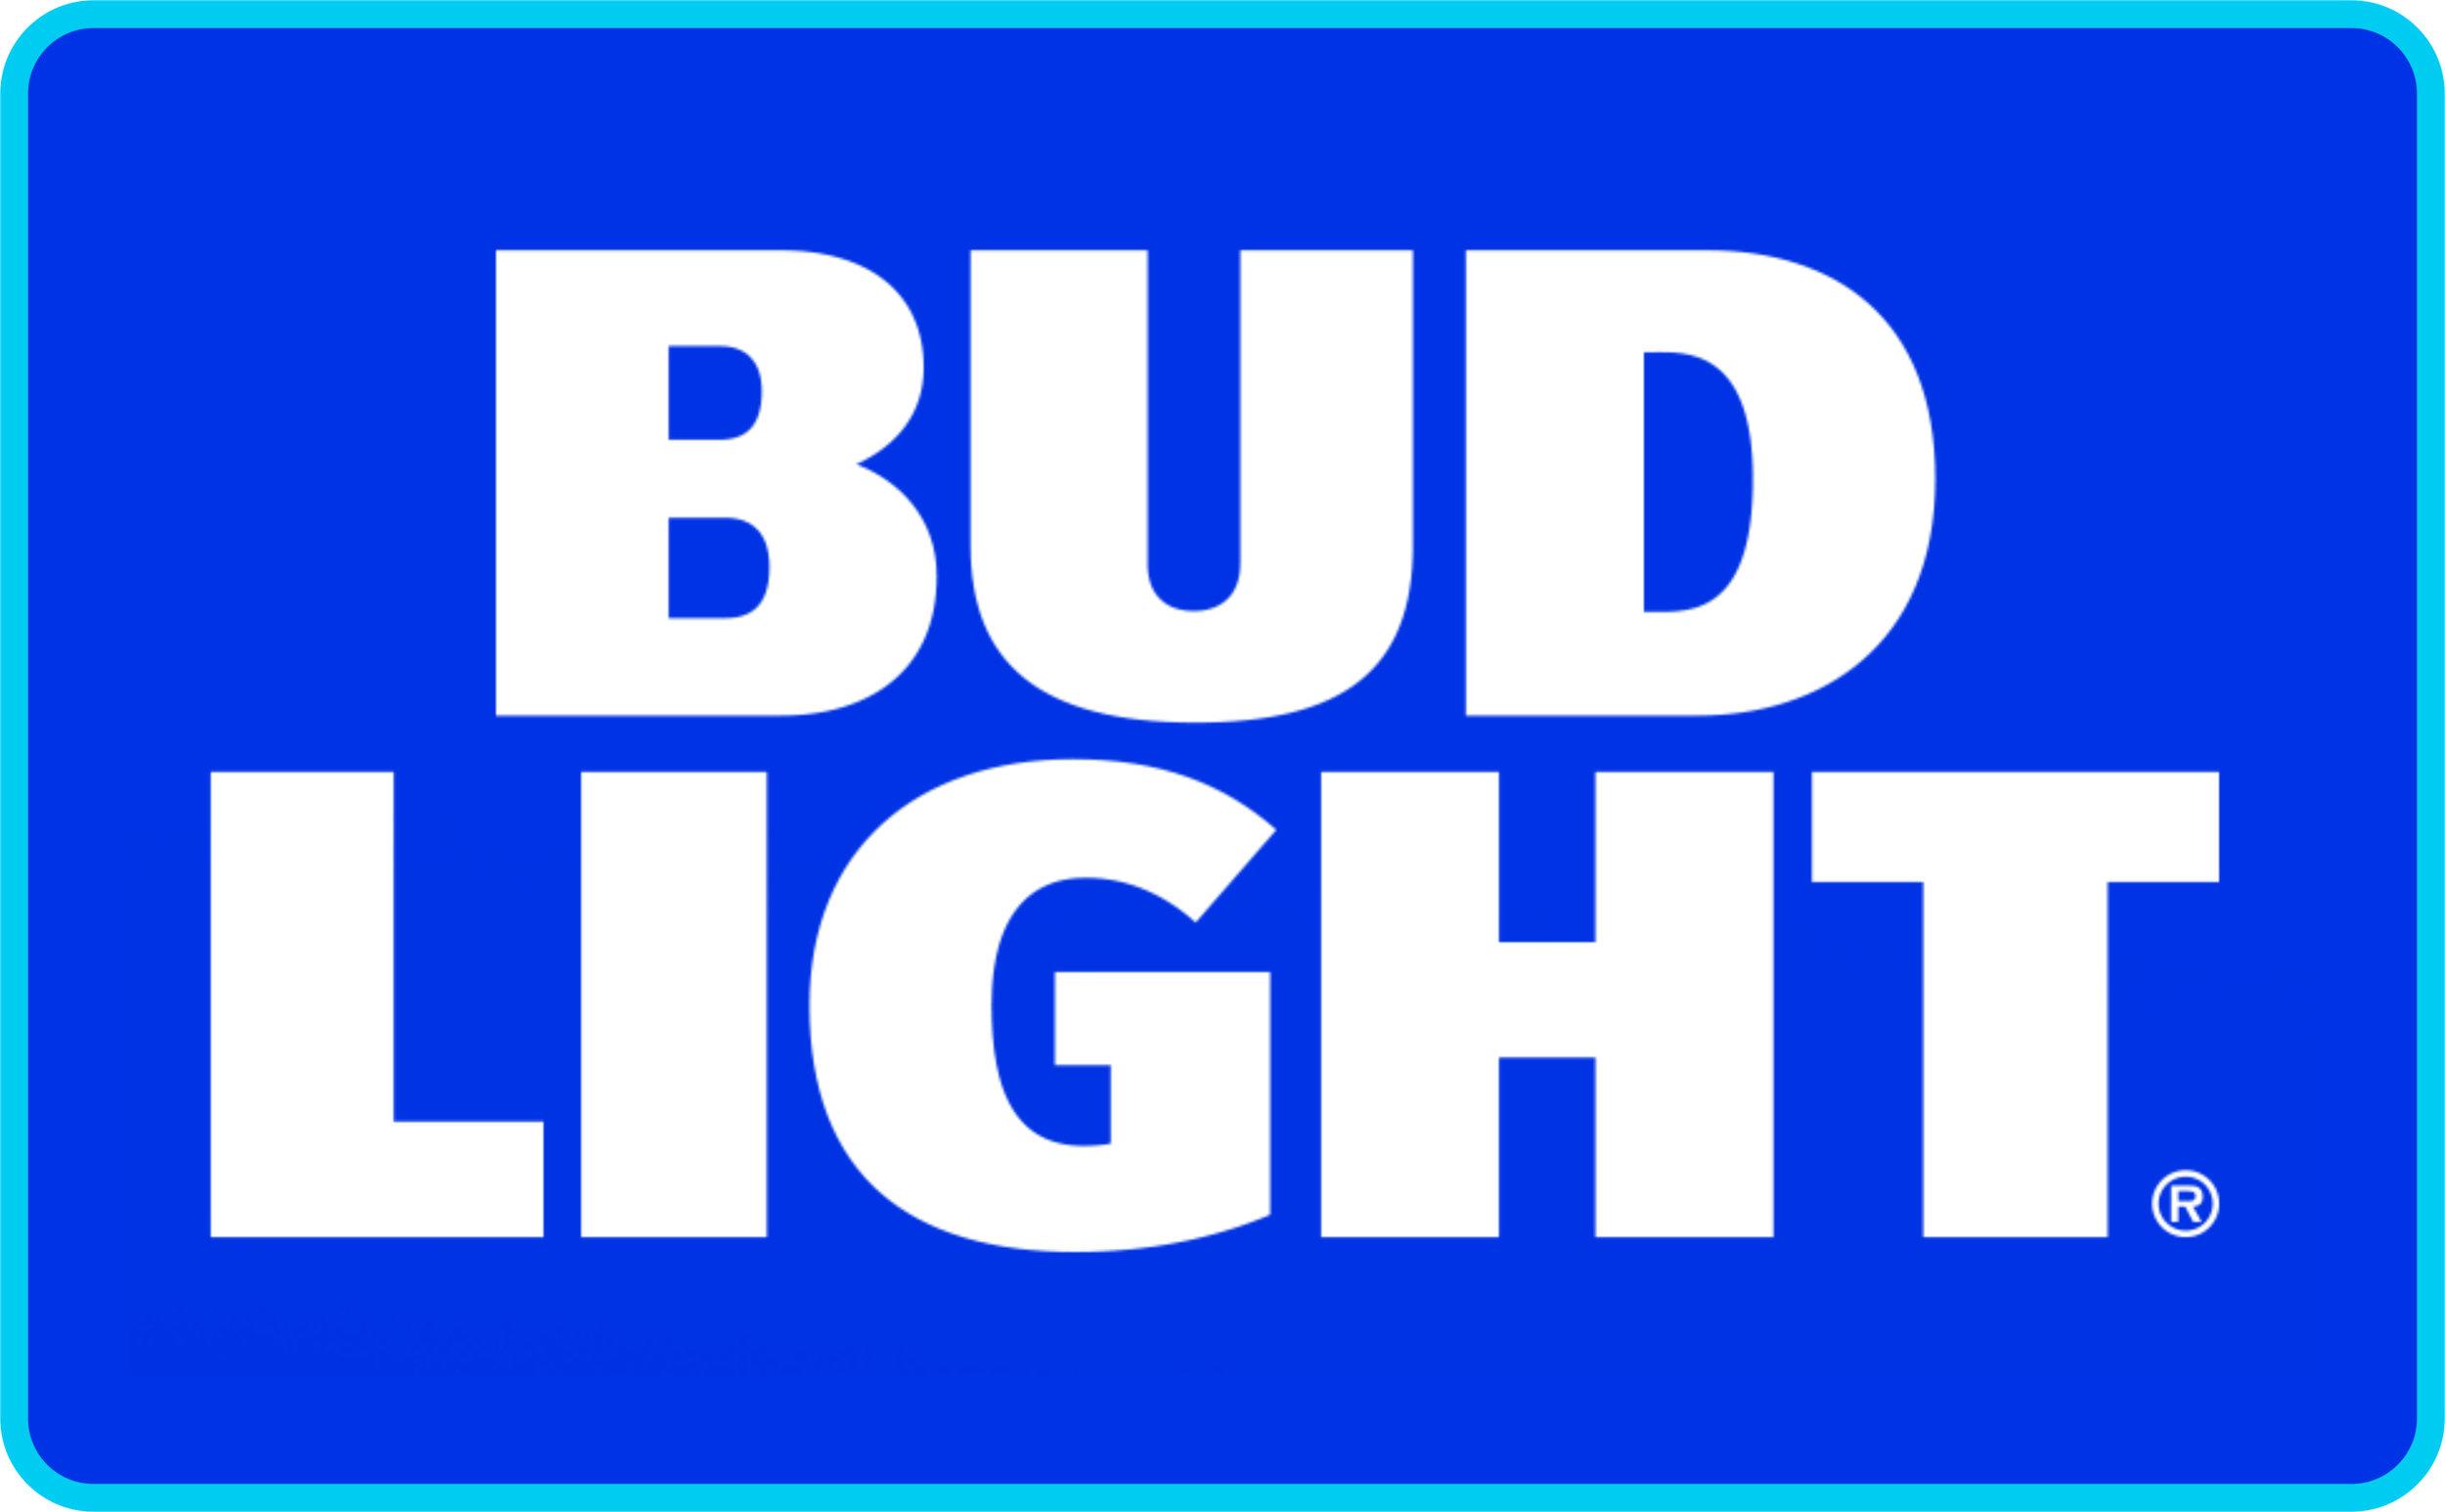 budlight2016.jpg